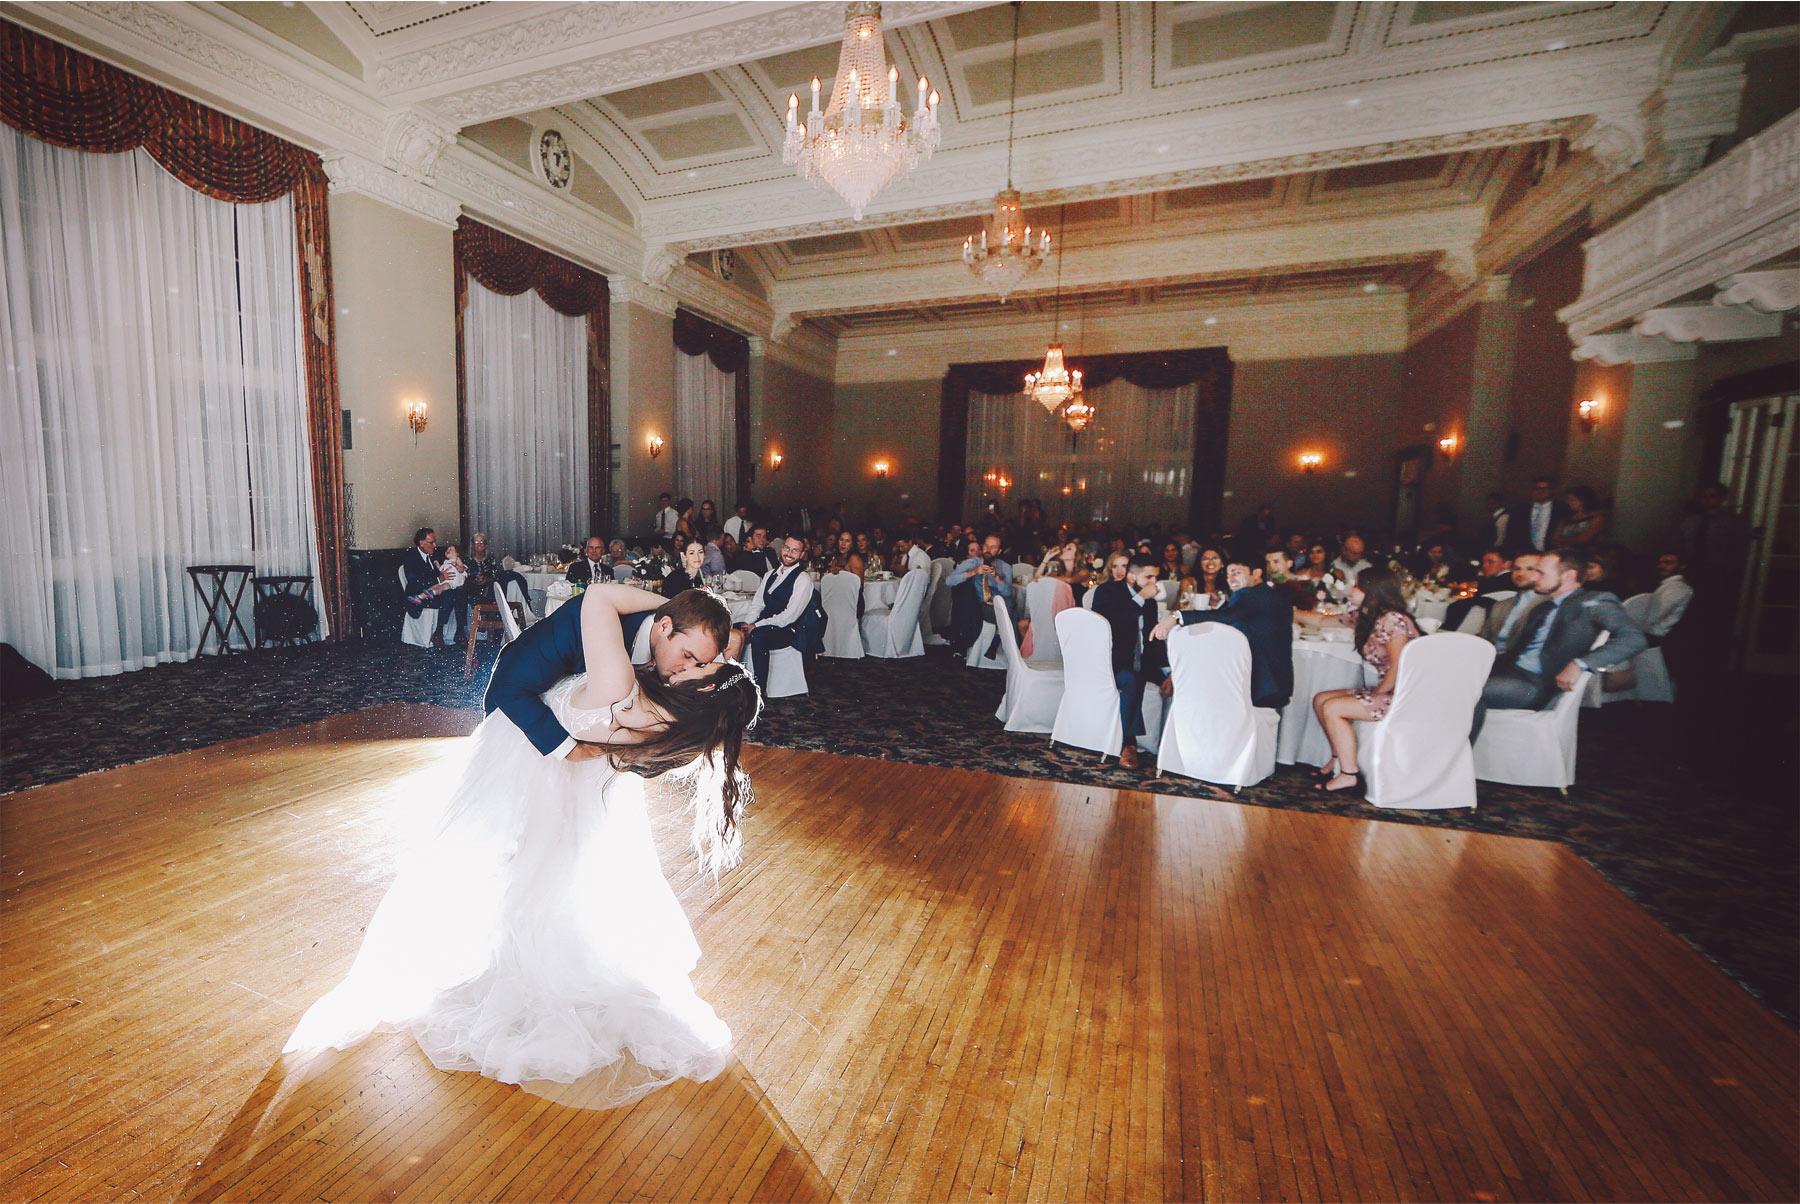 18-Saint-Paul-Minnesota-Wedding-Photography-by-Vick-Photography-Saint-Paul-Athletic-Club-Reception-First-Dance-Kelsey-and-Jeffery.jpg